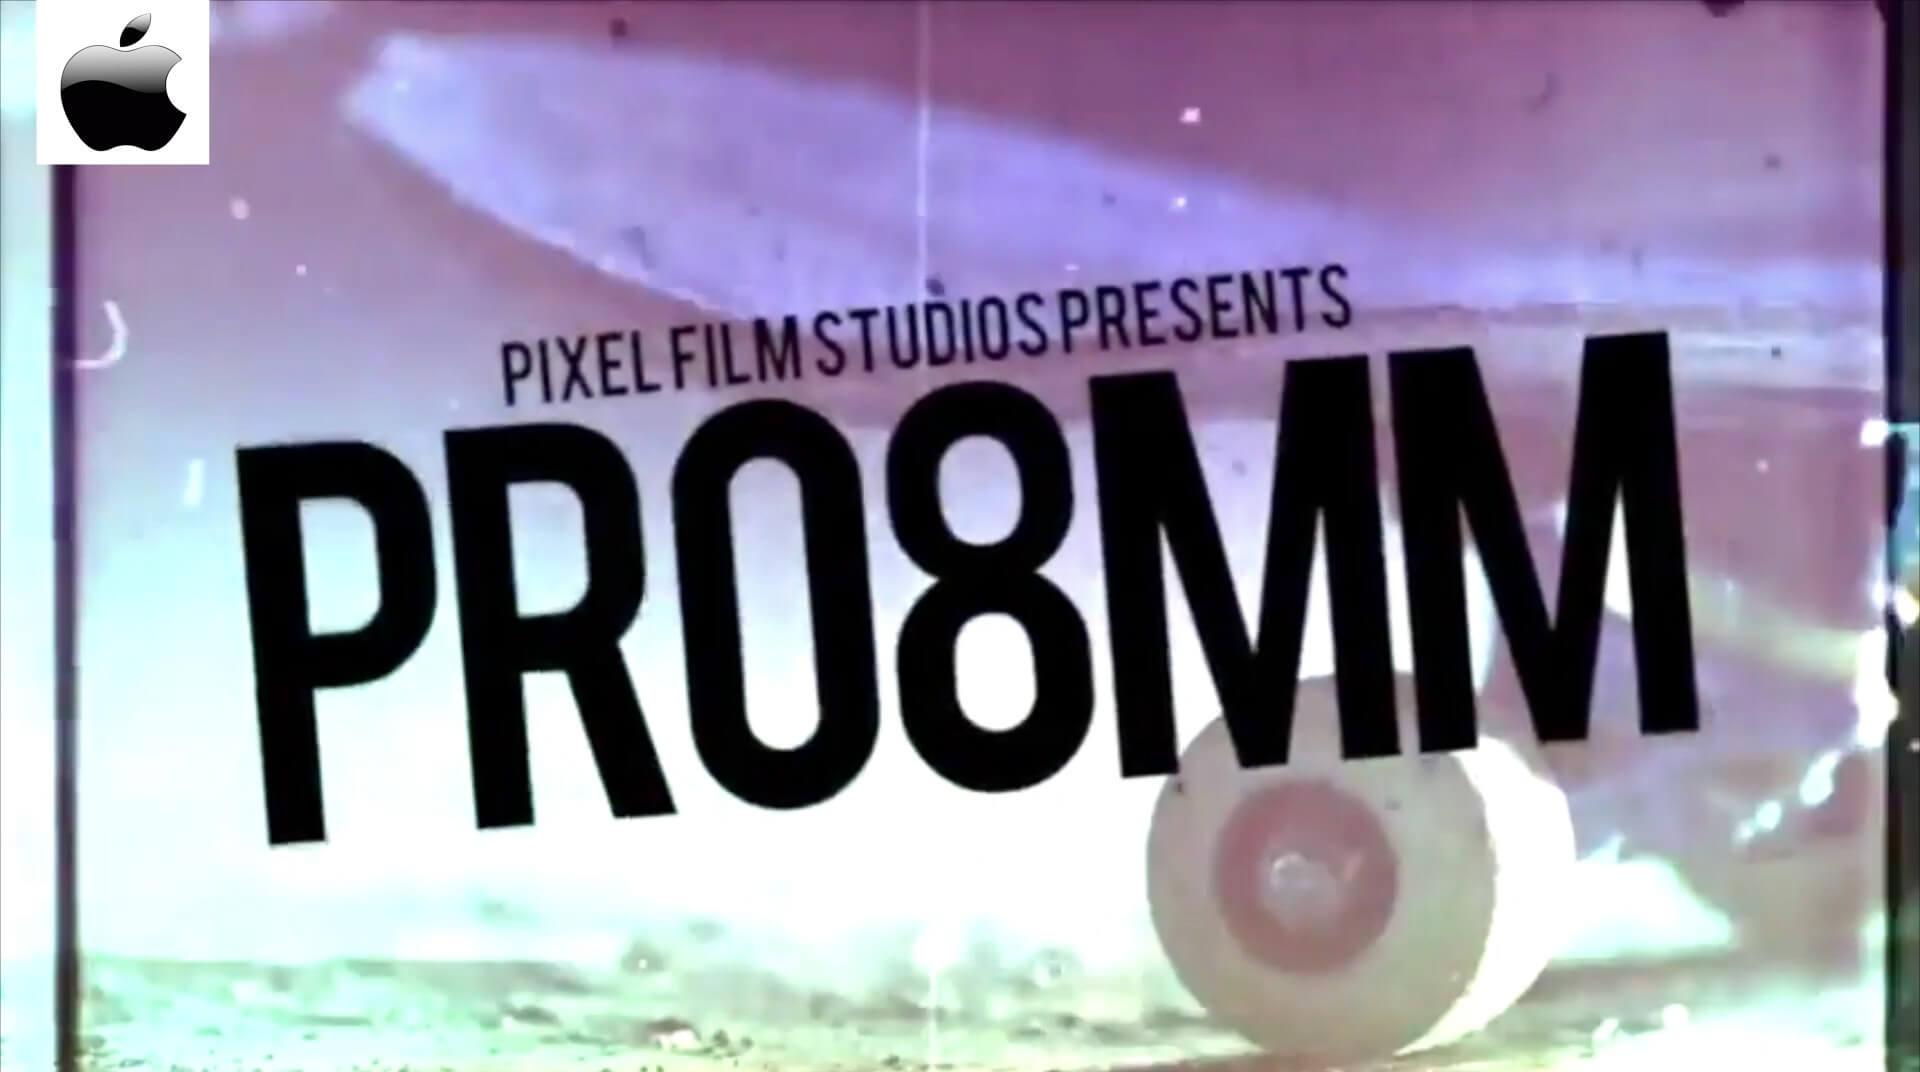 Fcpx效果插件 8毫米电影胶片复古风格化视觉效果 PRO8MM 免费下载